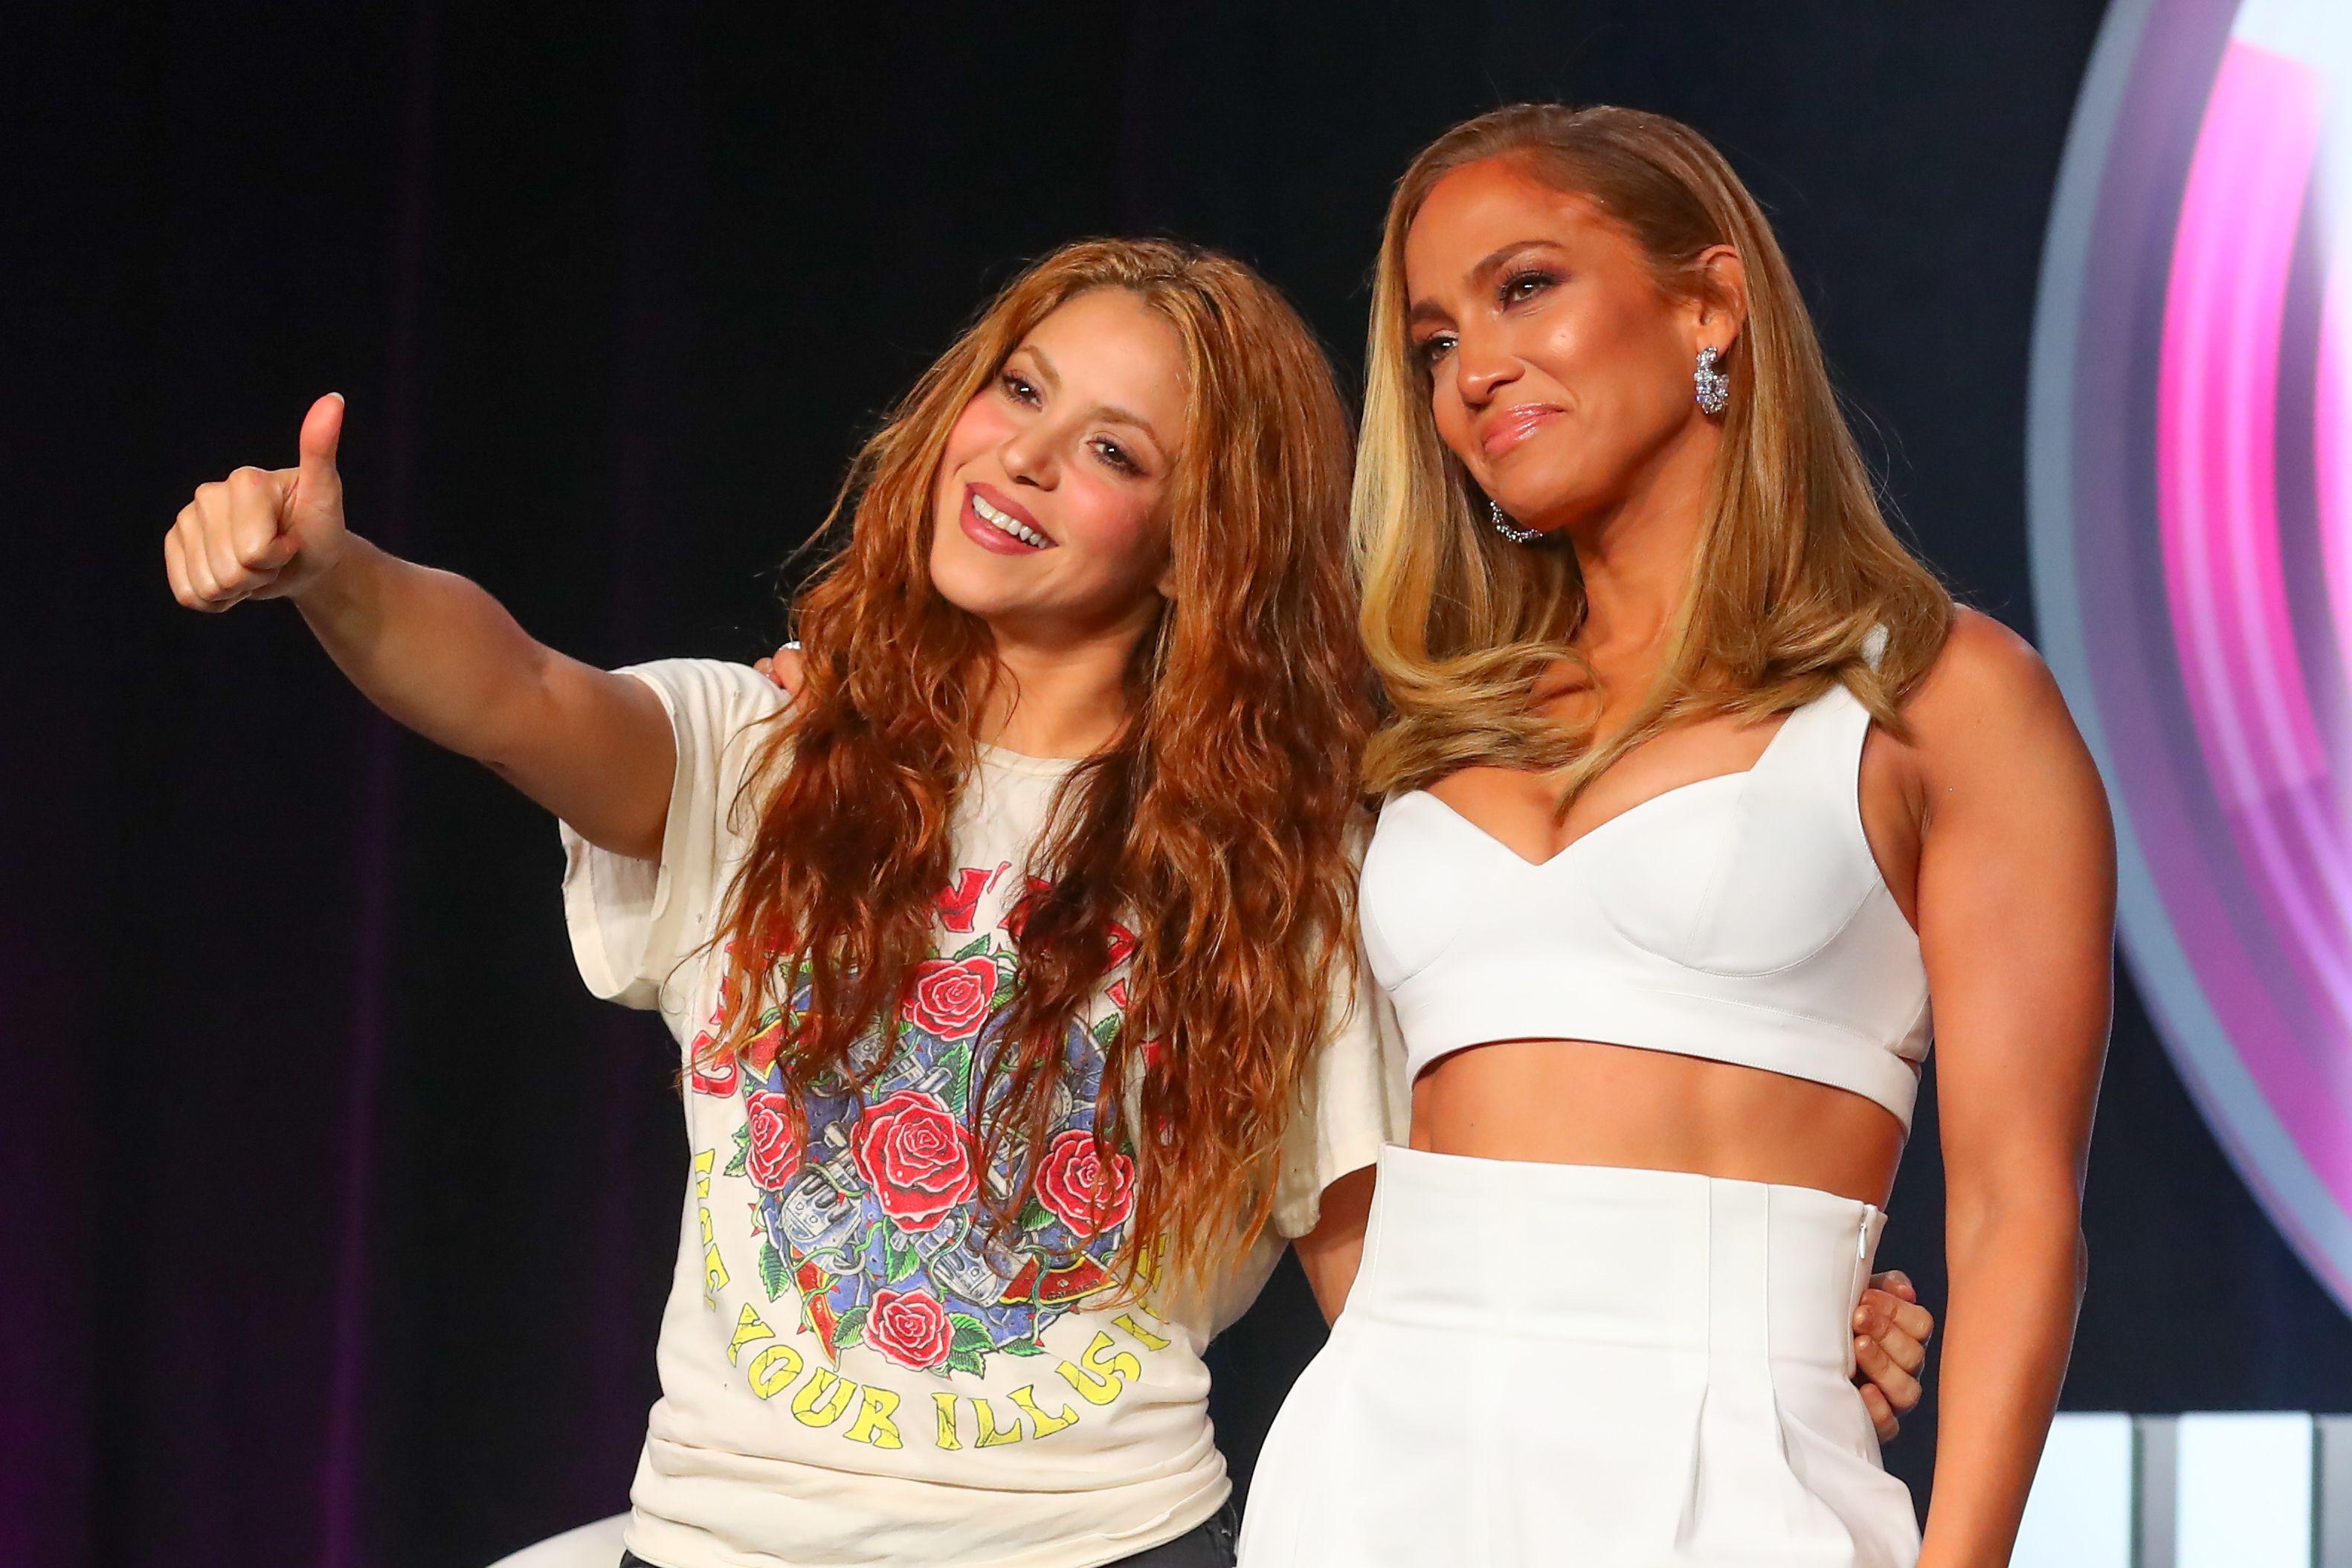 Shakira and J.Lo